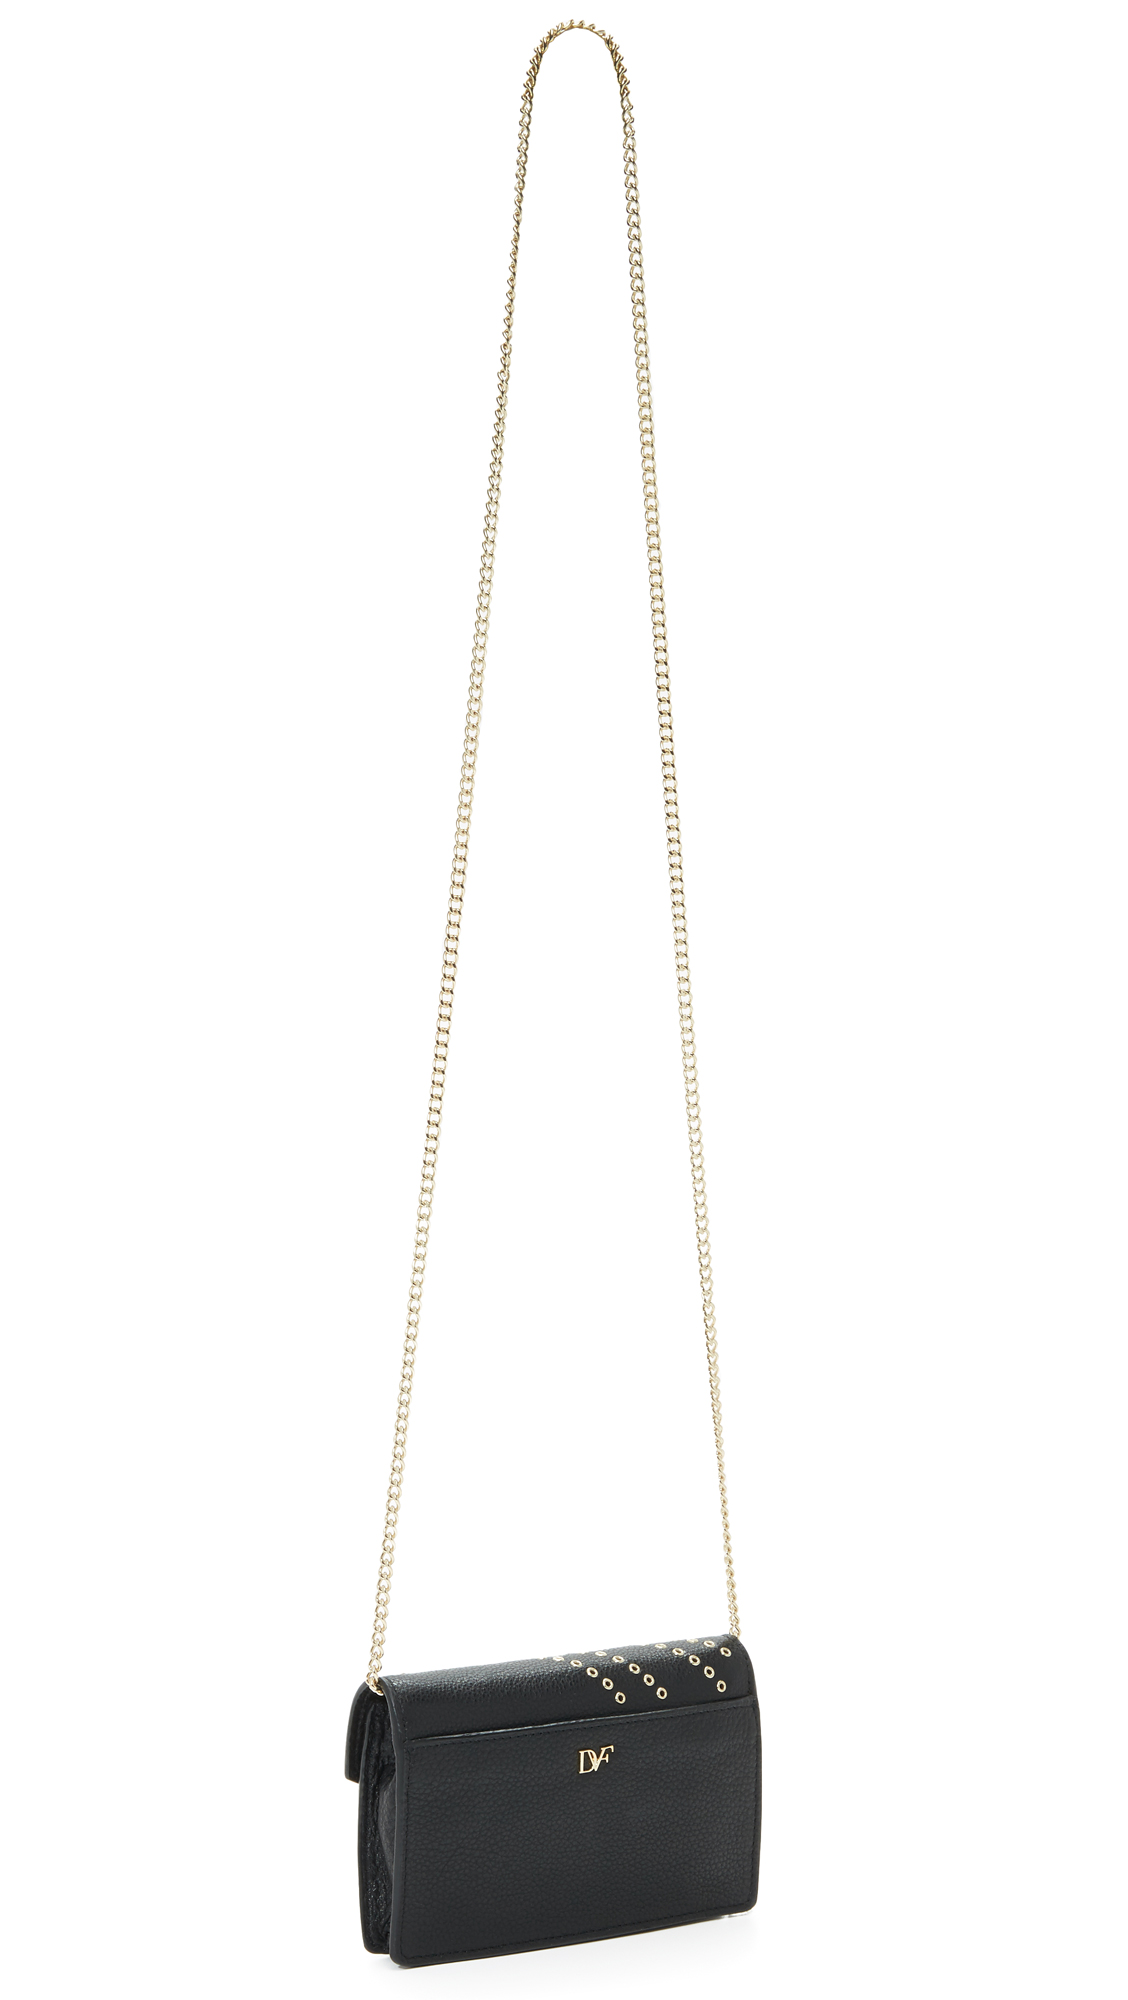 Diane von Furstenberg 440 Gallery Bitsy Cross Body Bag | SHOPBOP ... for Ring Stand Chemistry  146hul